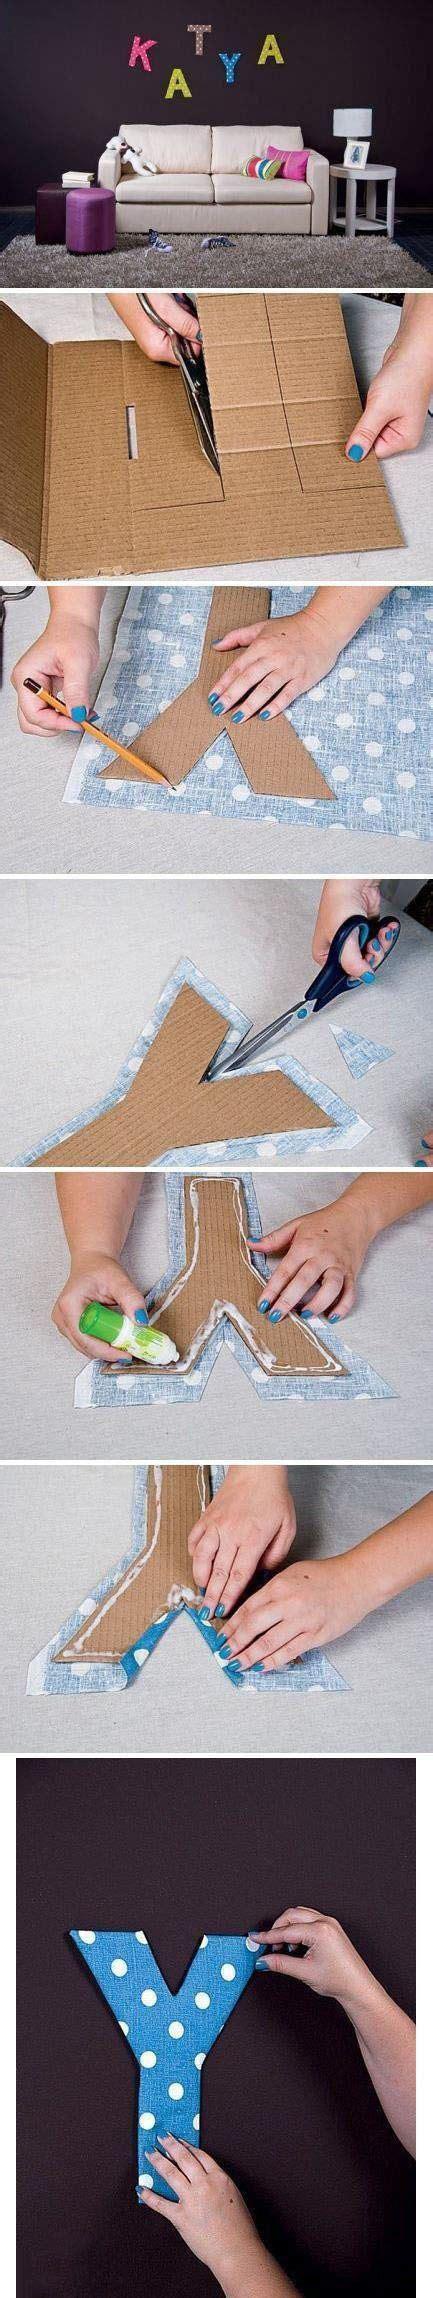 fabric and cardboard wall letters diy diy n crafts